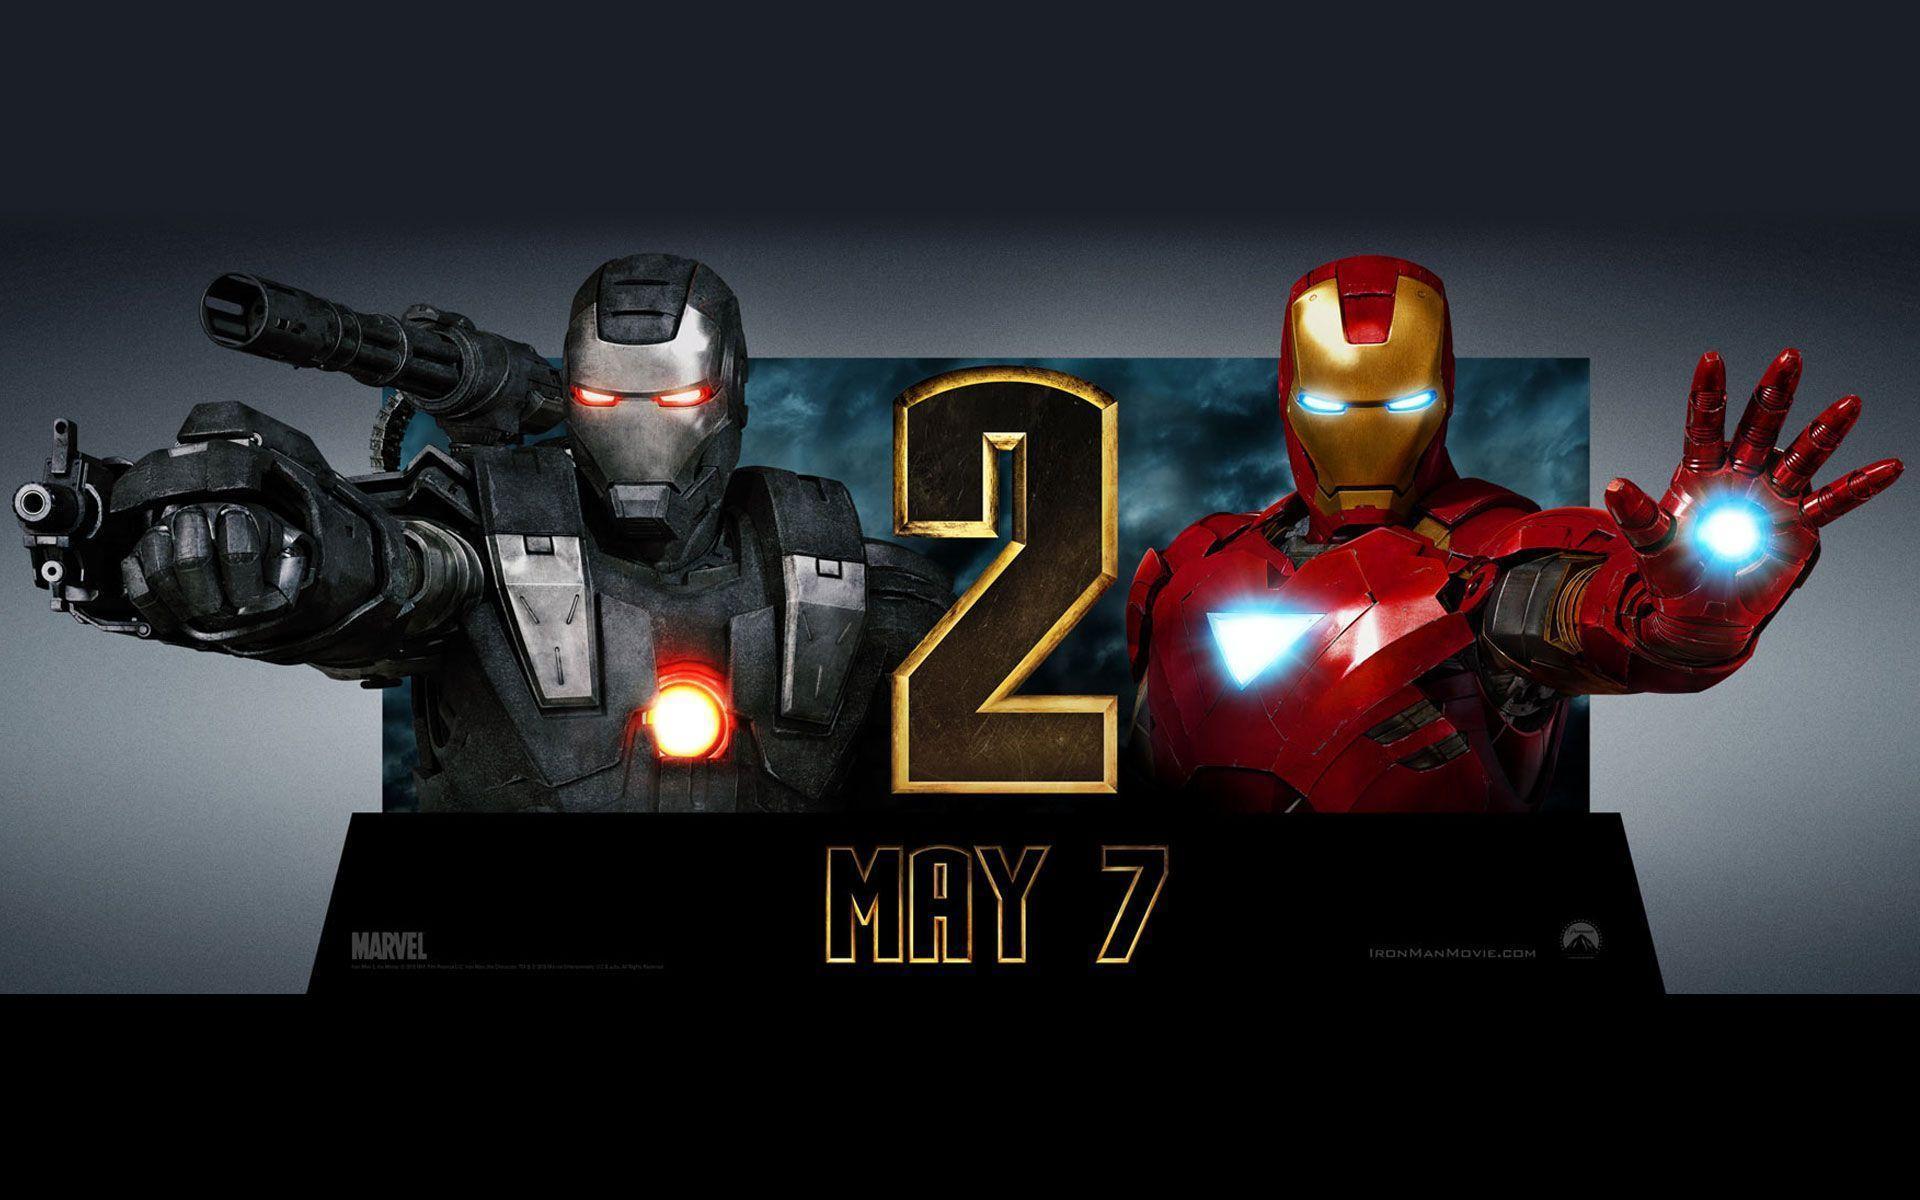 Iron man 2 war machine wallpaper